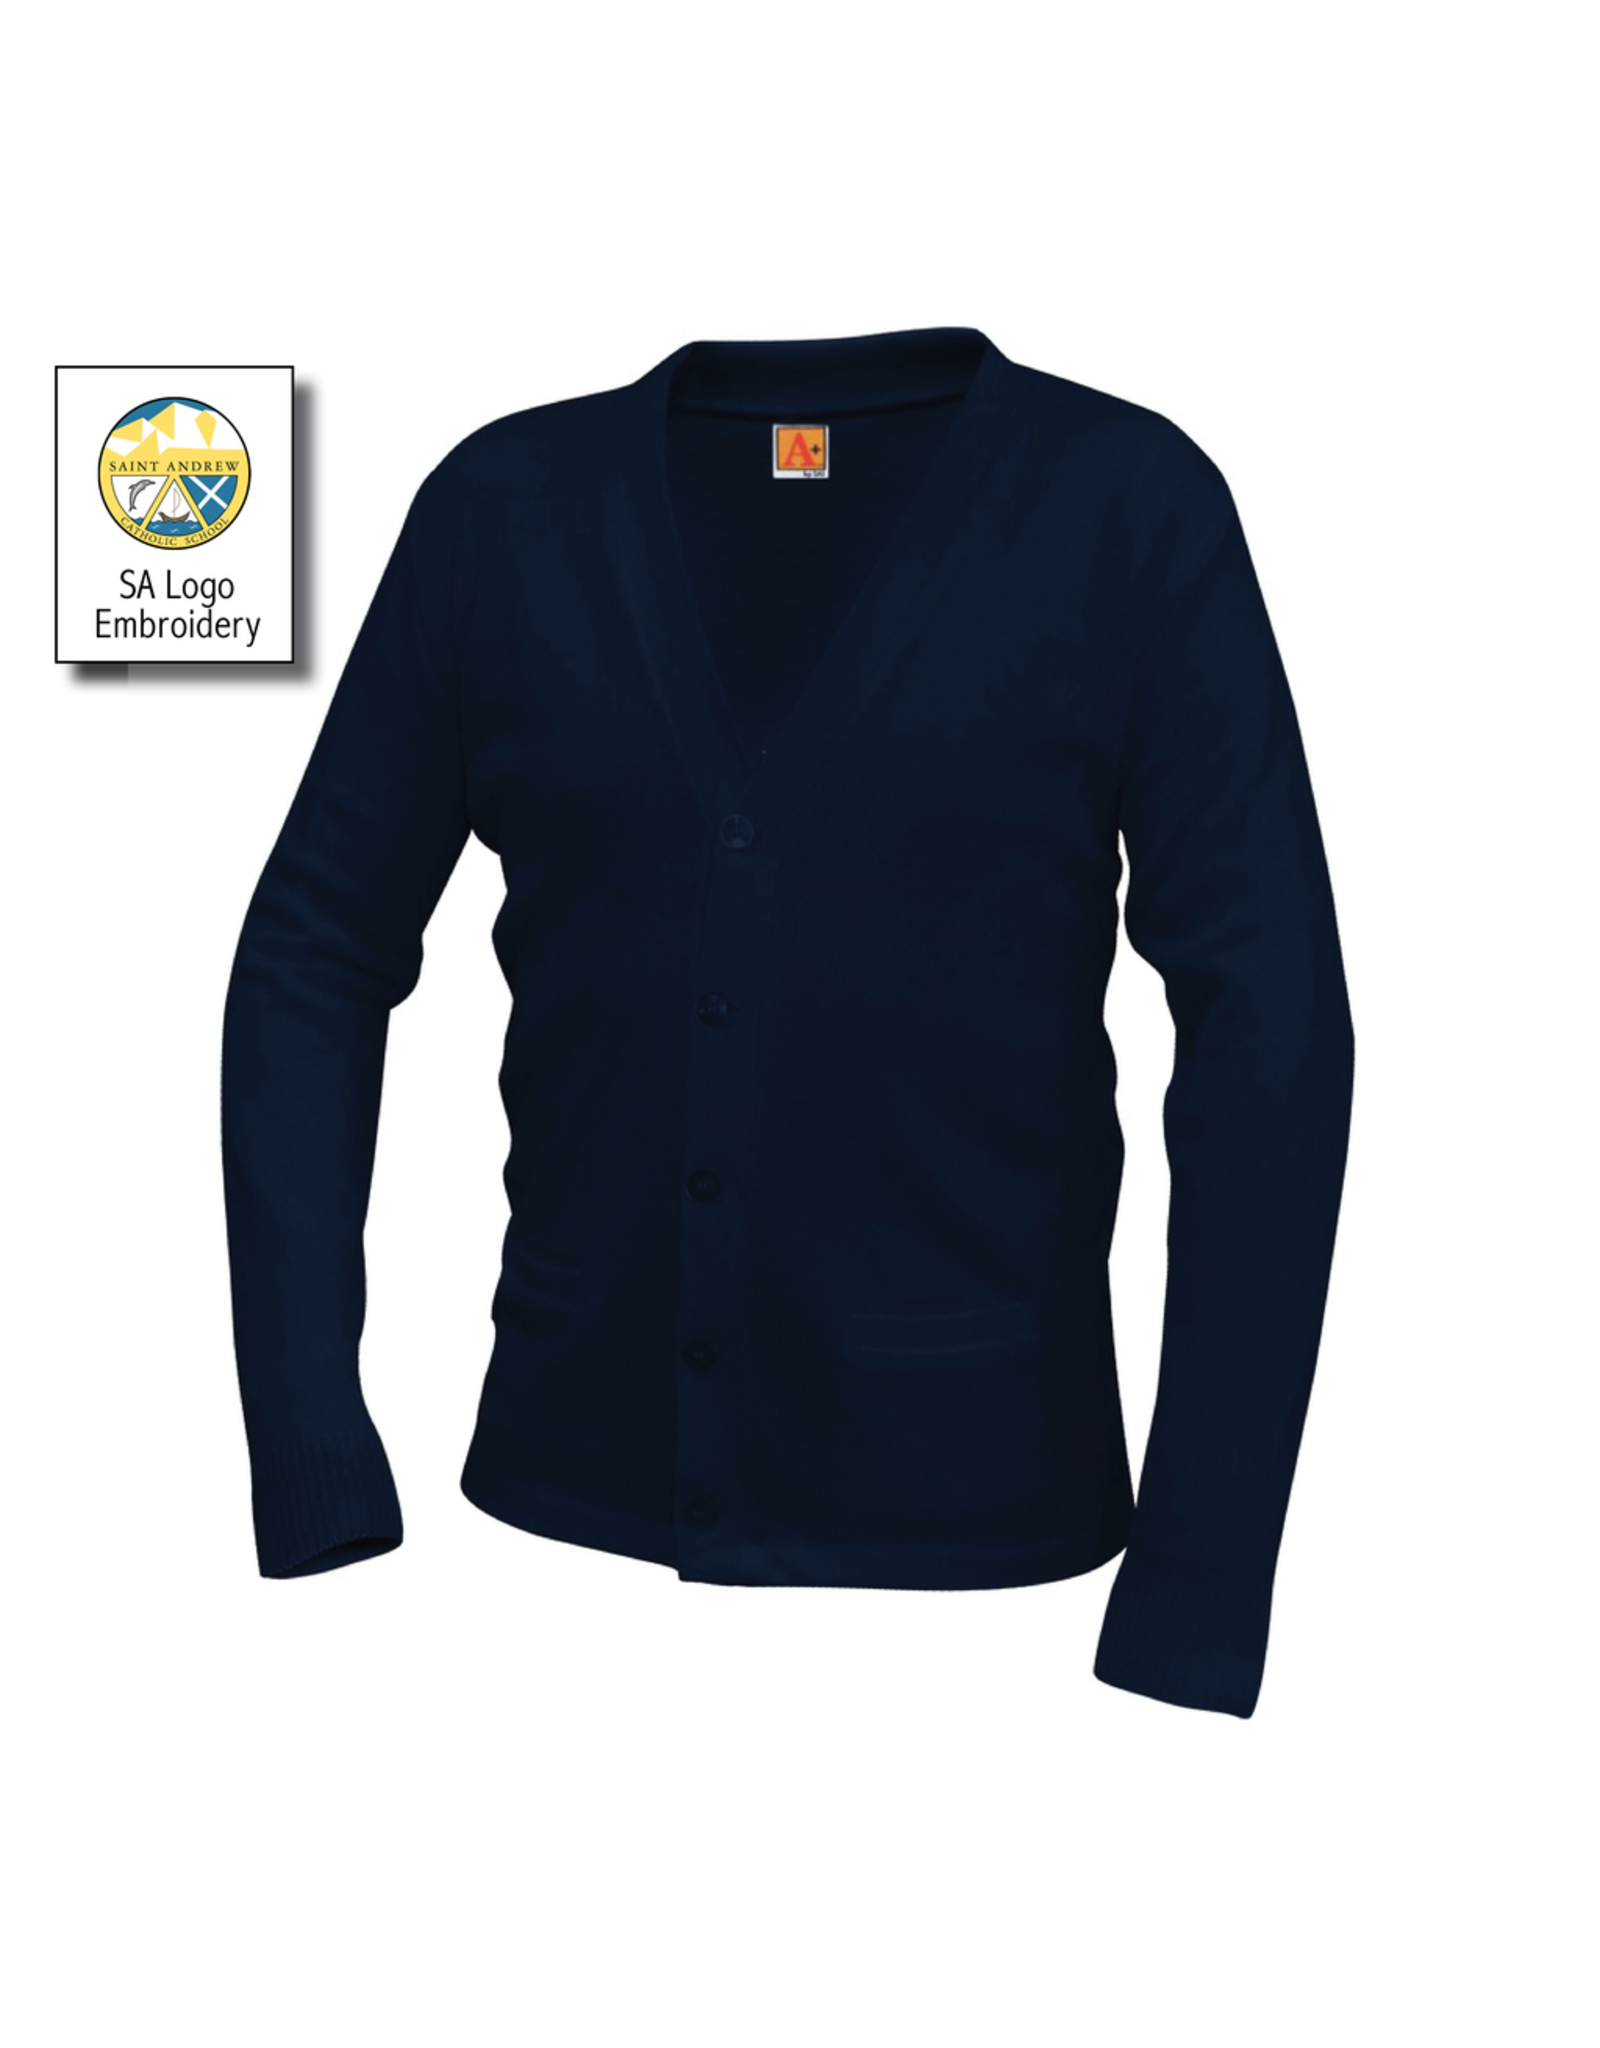 UNIFORM Saint Andrew Cardigan Sweater, Unisex